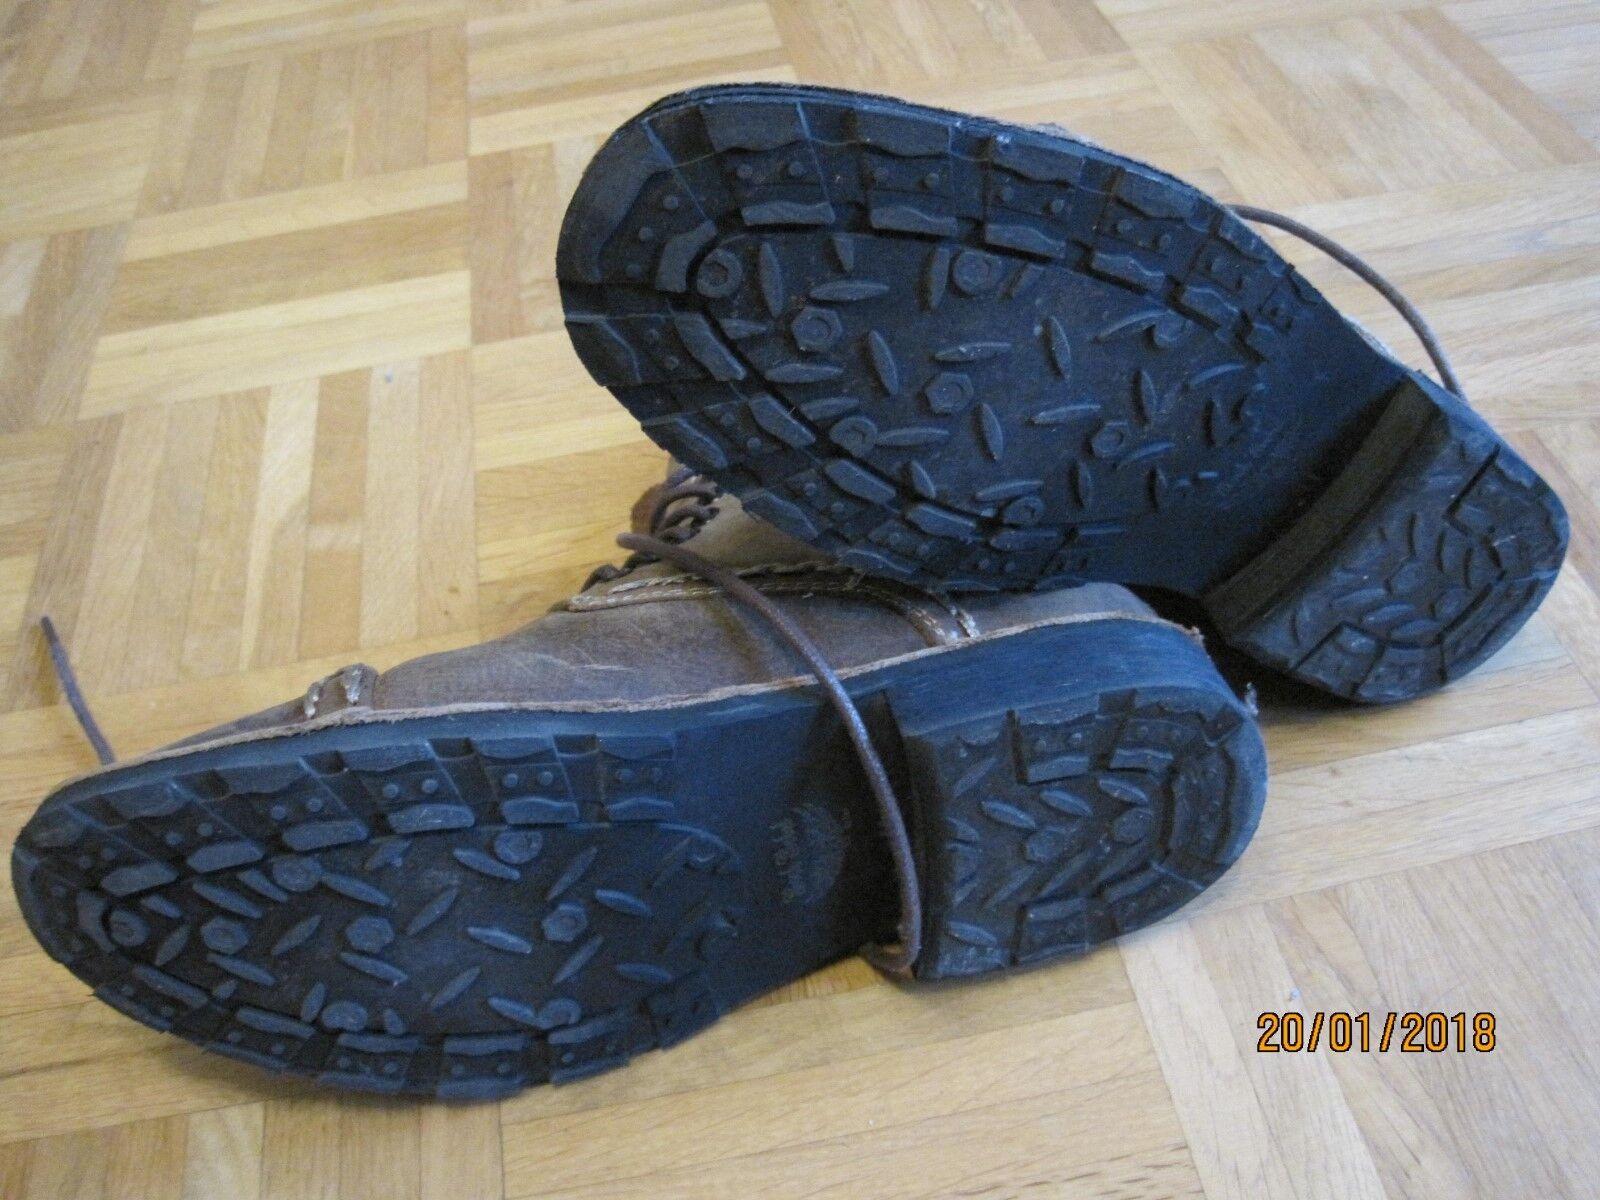 Rock Rebel by EMP Corded EU41 Leder Boot Stiefel braun EU41 Corded 9b9a05